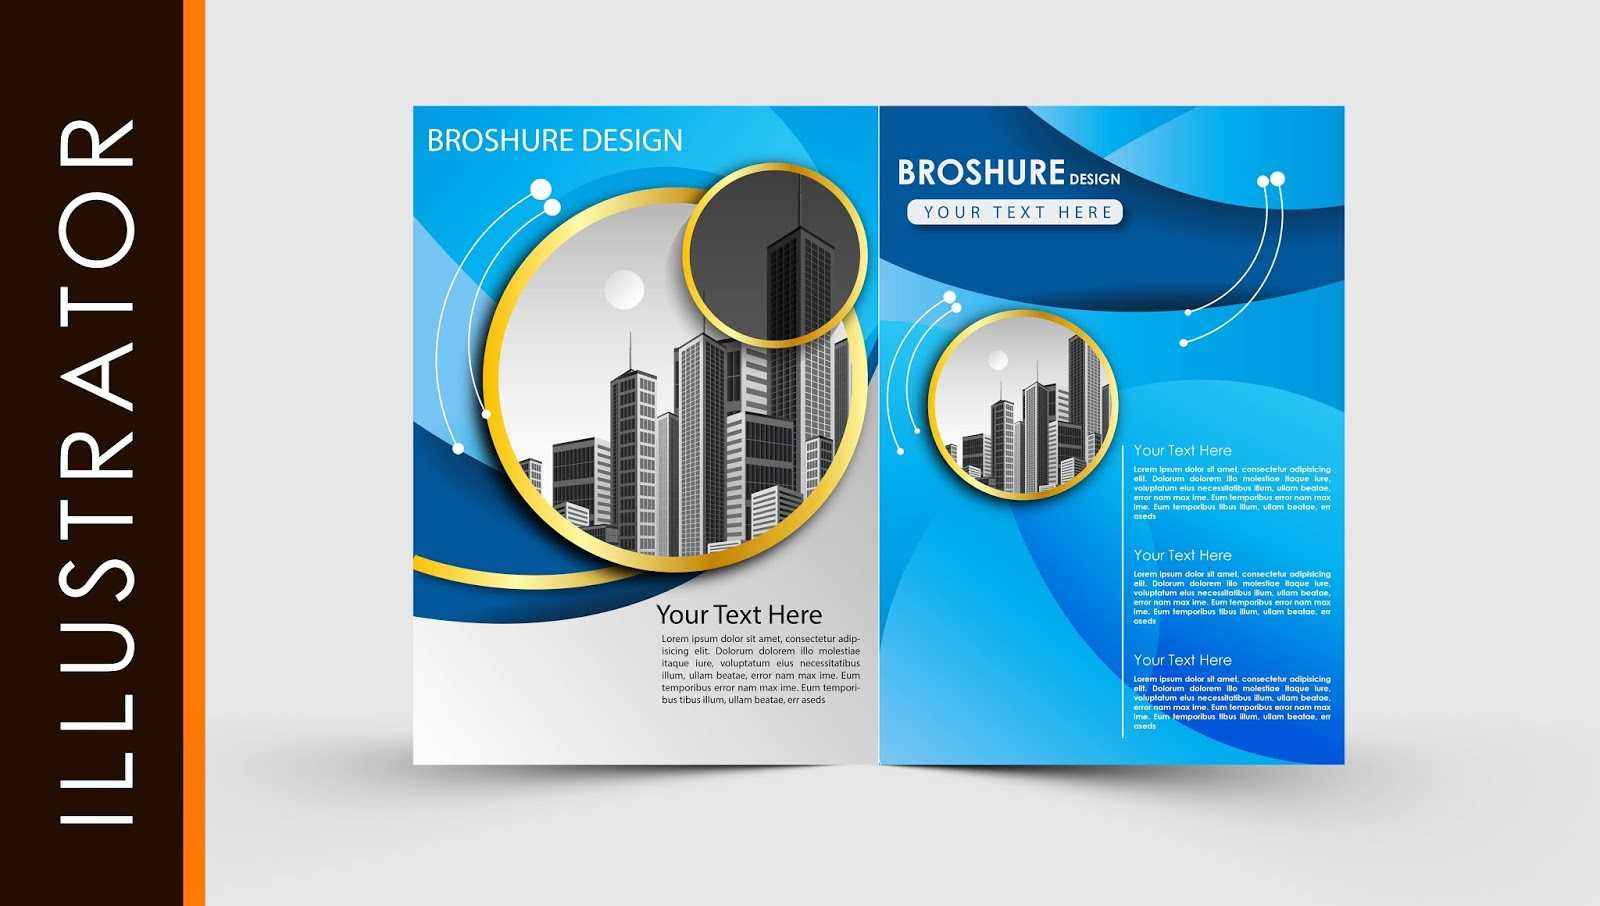 Free Download Adobe Illustrator Template Brochure Two Fold Within Brochure Template Illustrator Free Download